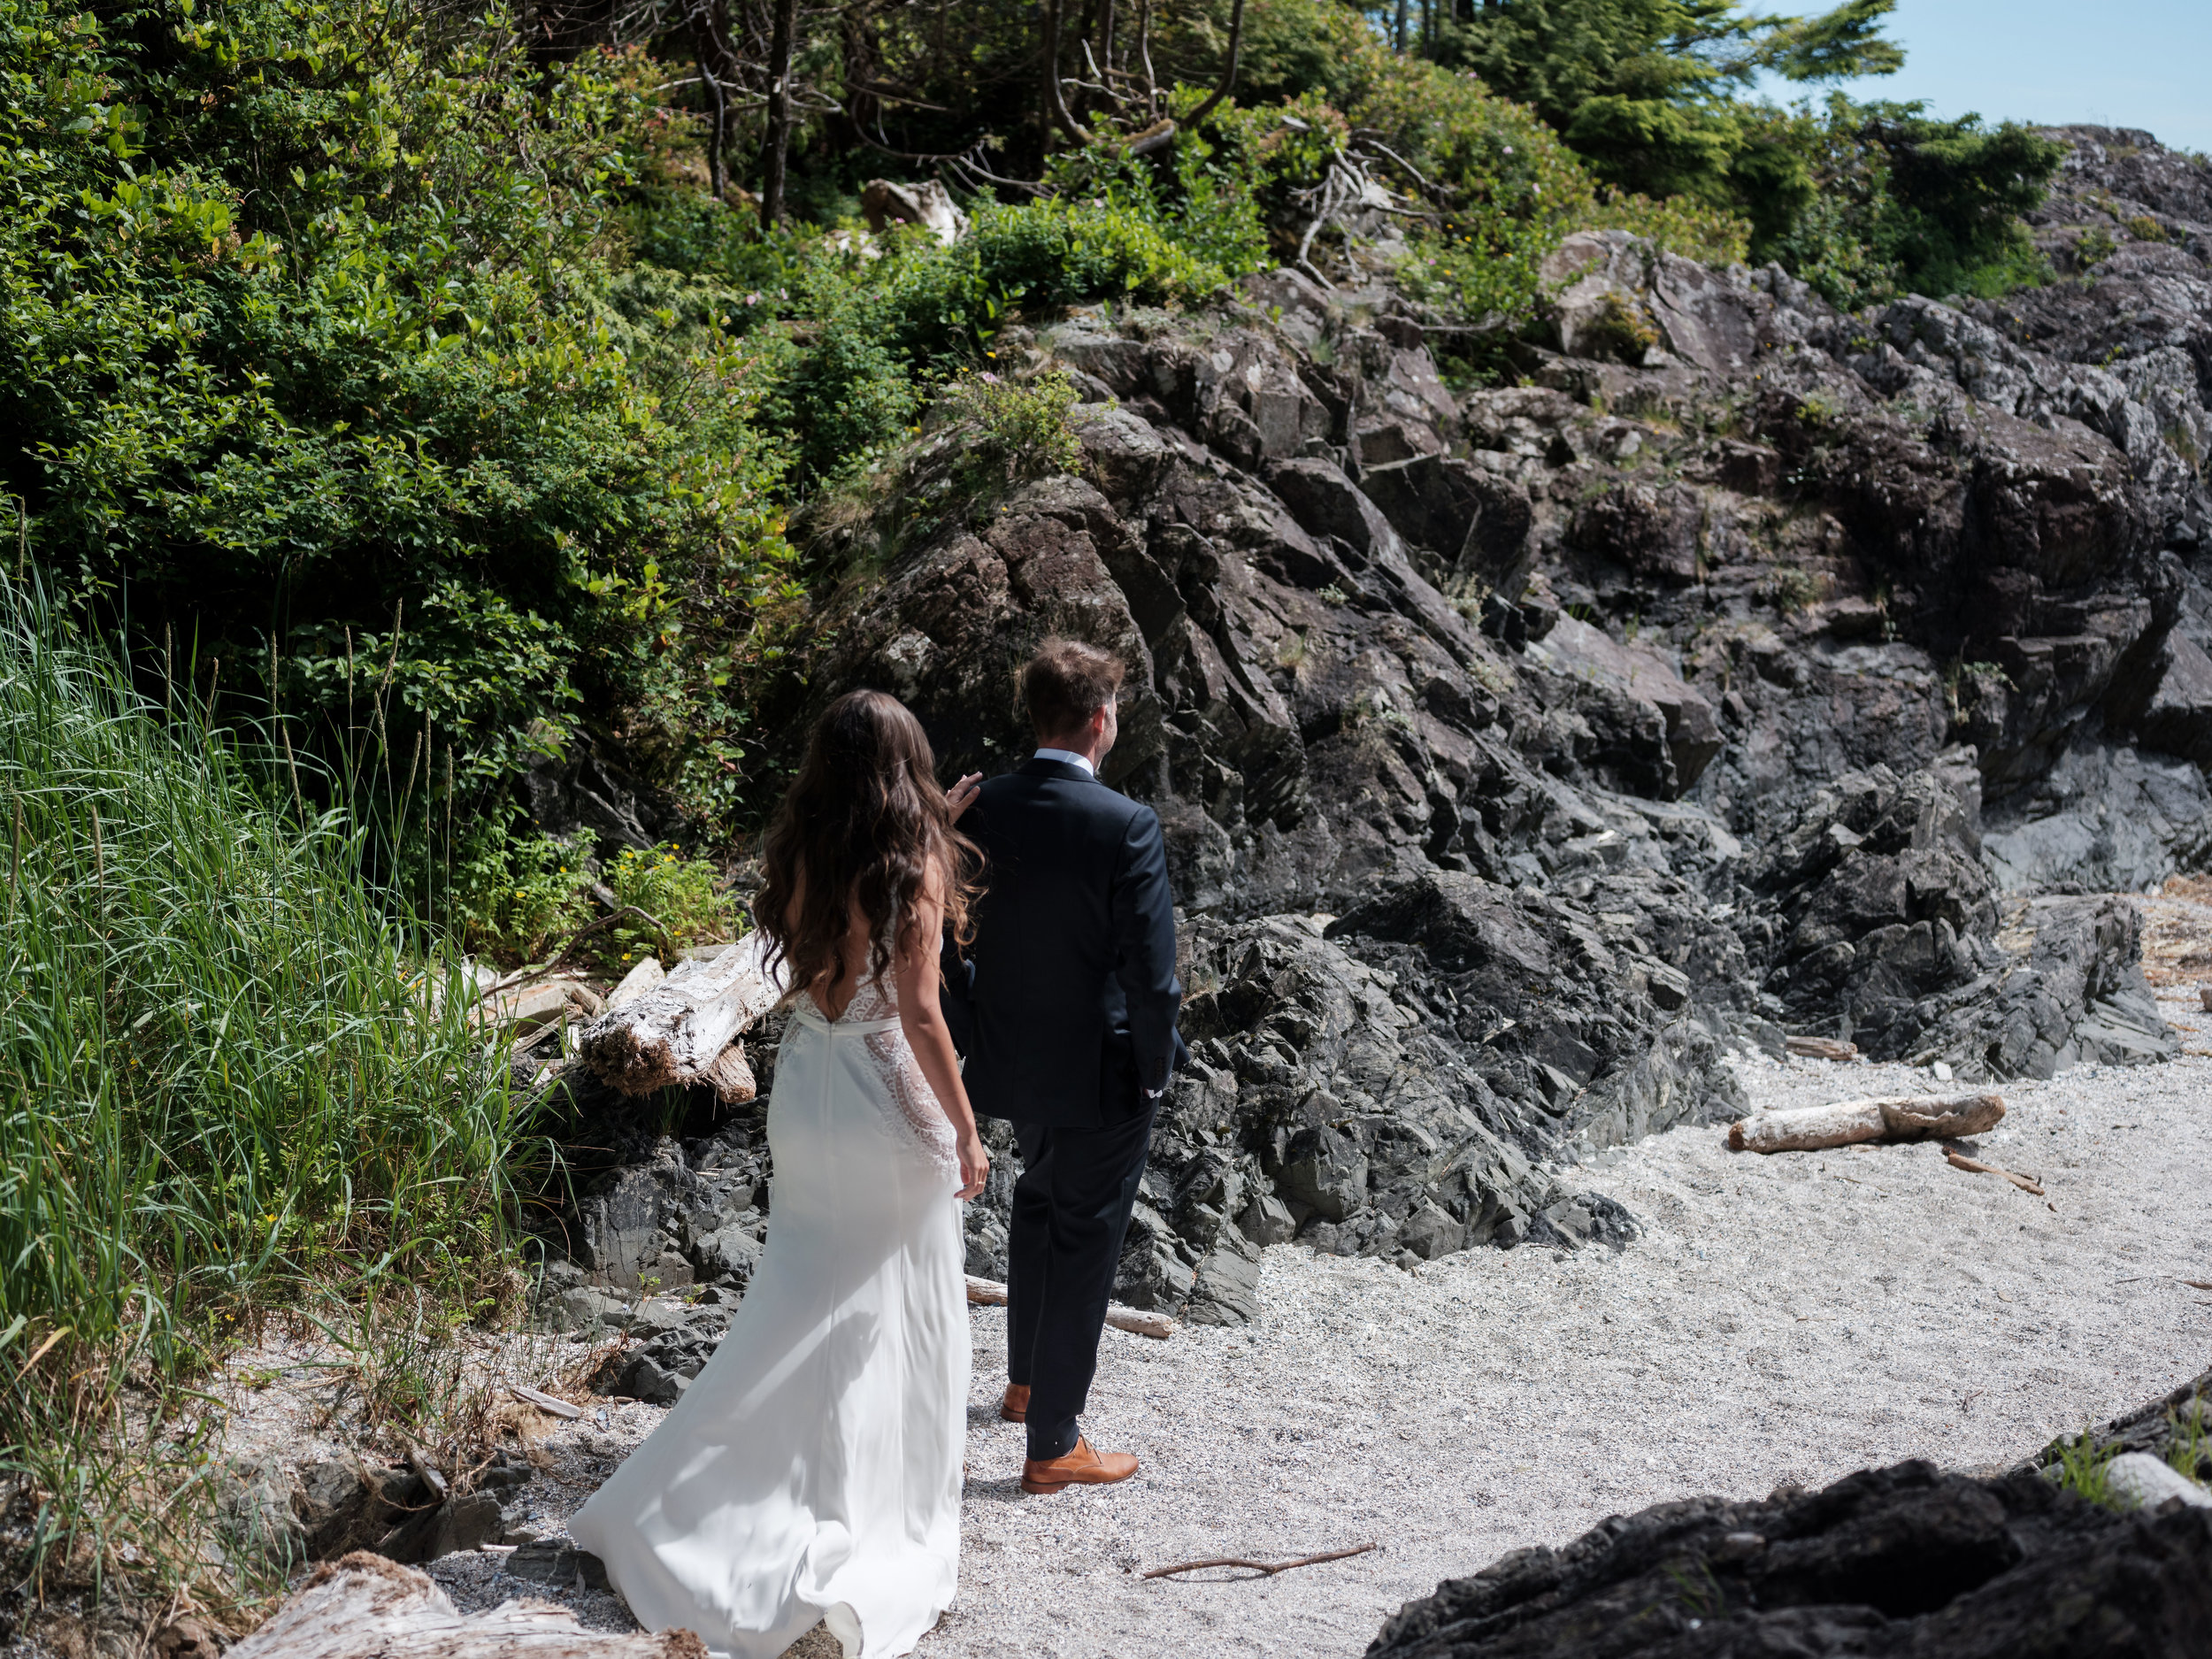 tofino ucluelet wedding engagement photographer photography PLP_18_06_CarlaGreg-152.jpg